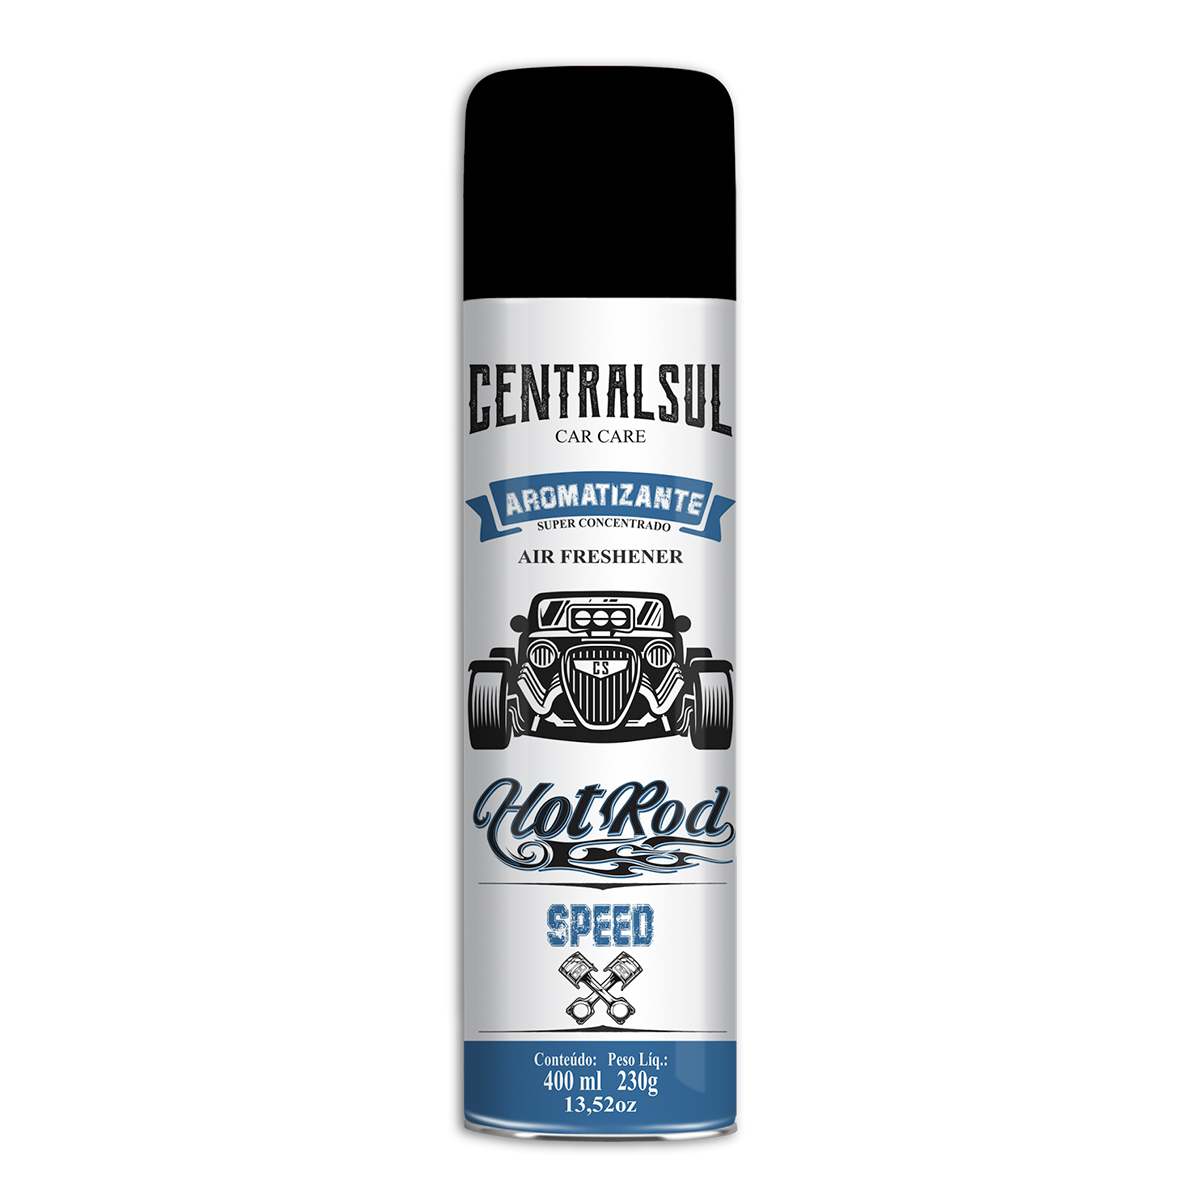 Aromatizante Hot Rod Speed 400ml - Centralsul